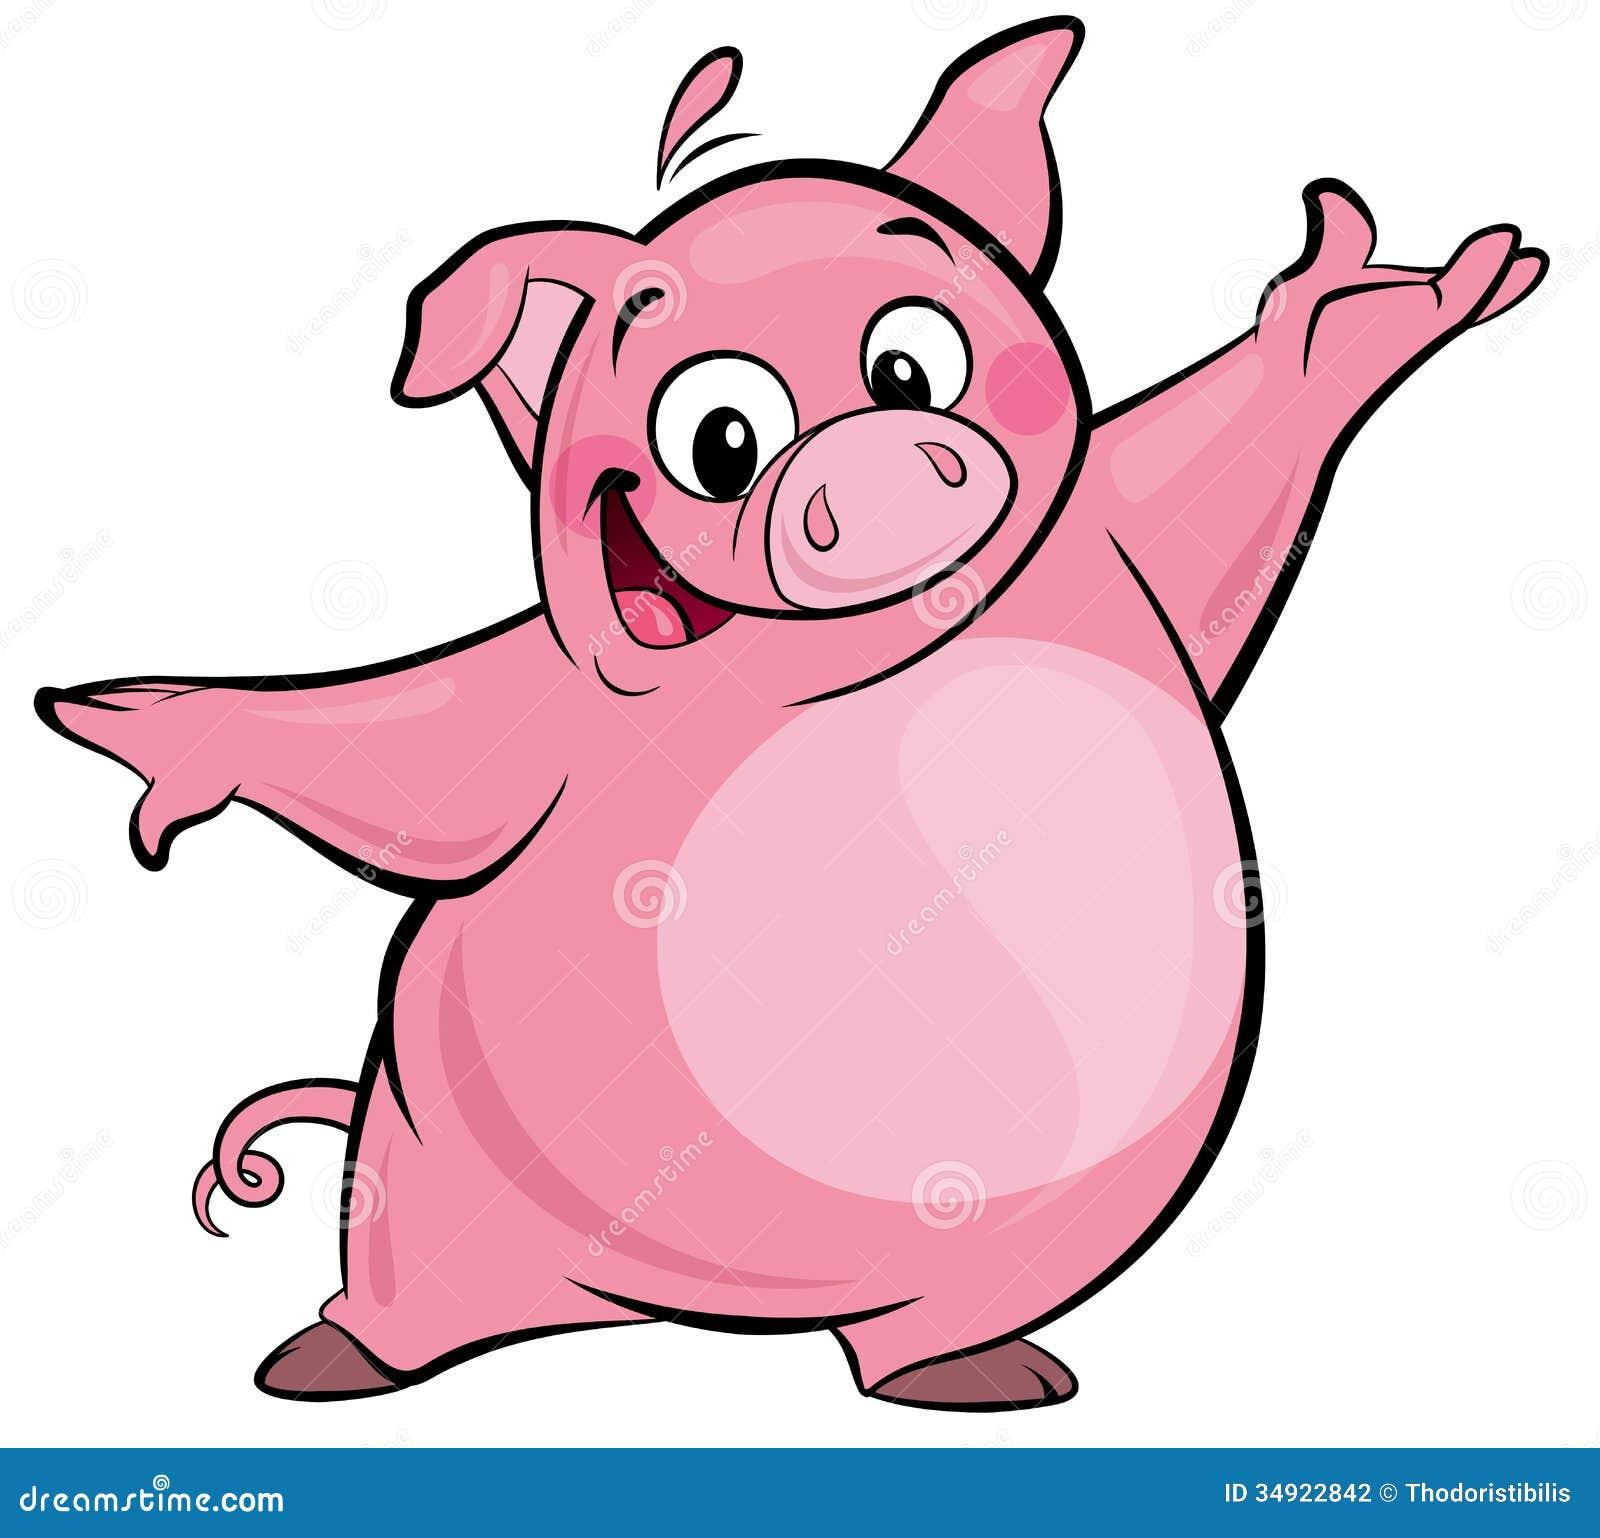 cartoon happy cute pink pig character presenting stock illustration